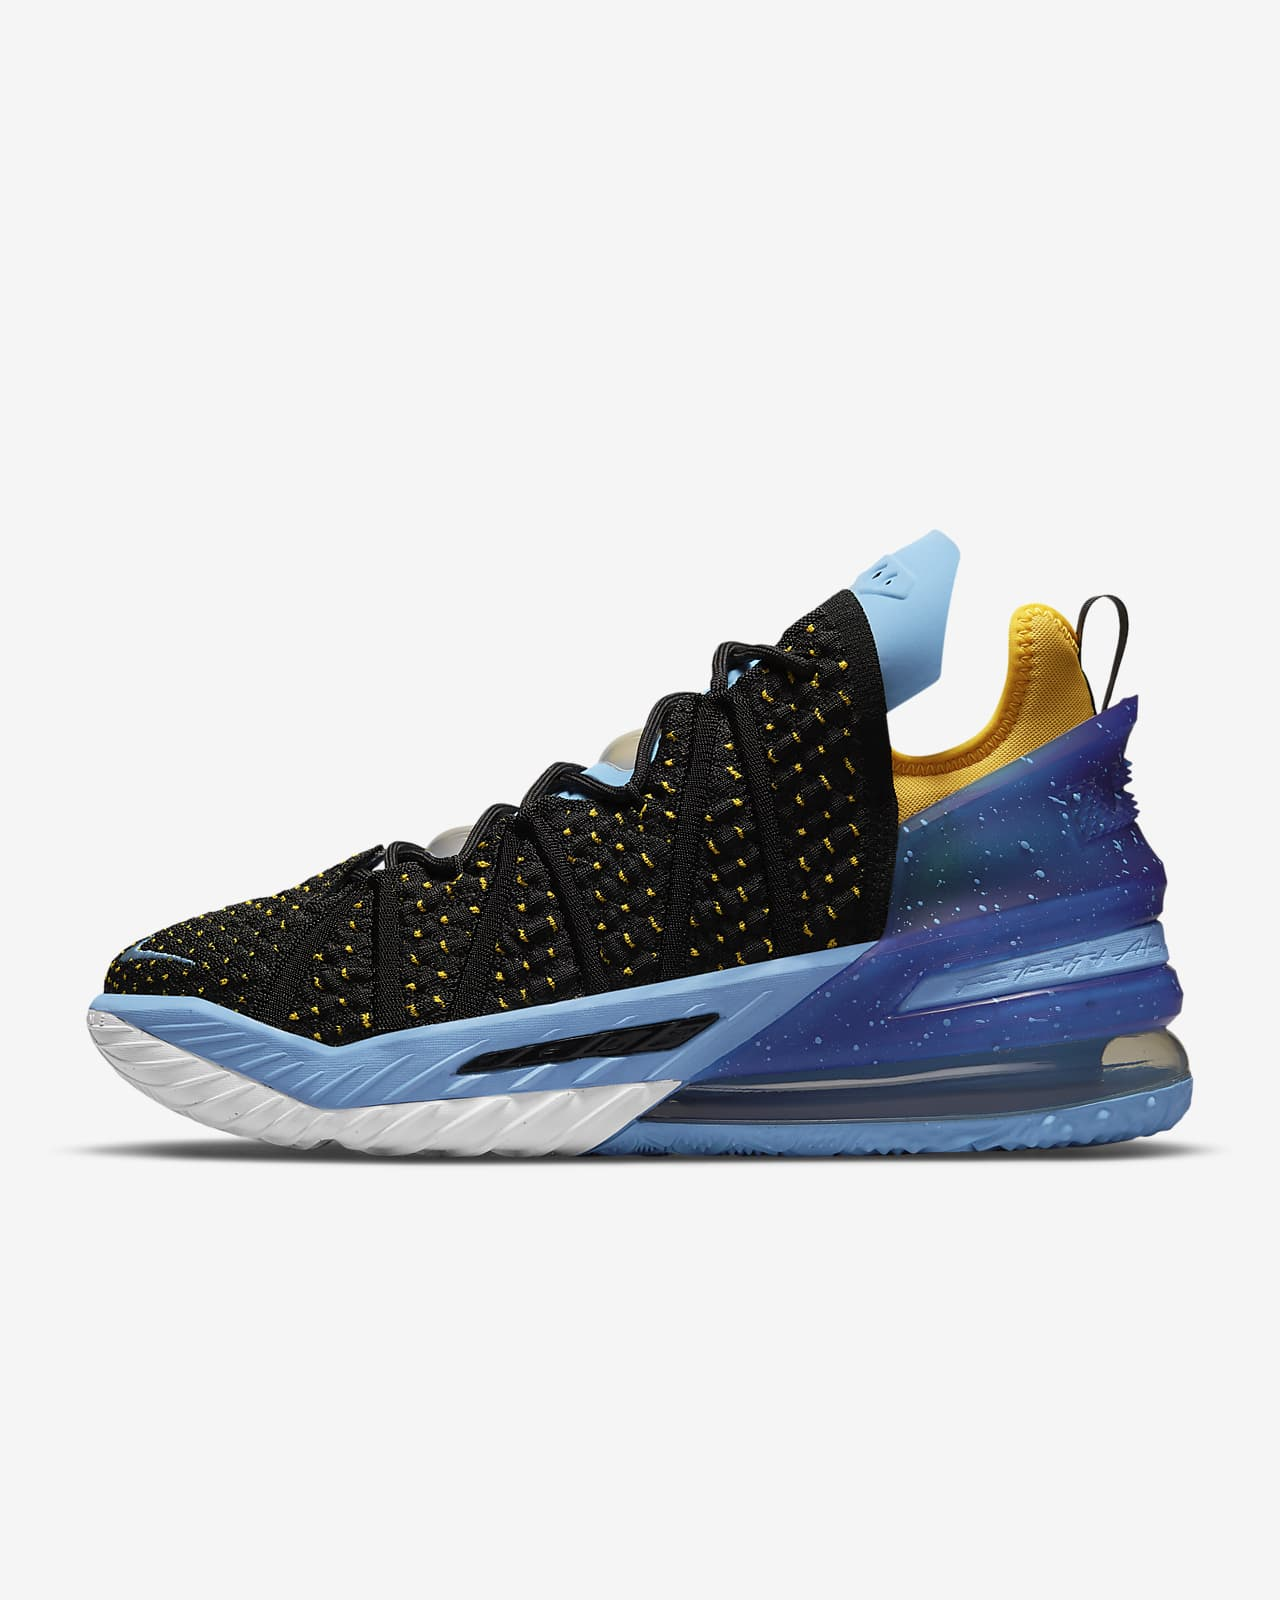 Chaussure de basketball LeBron18 «Dynasty»